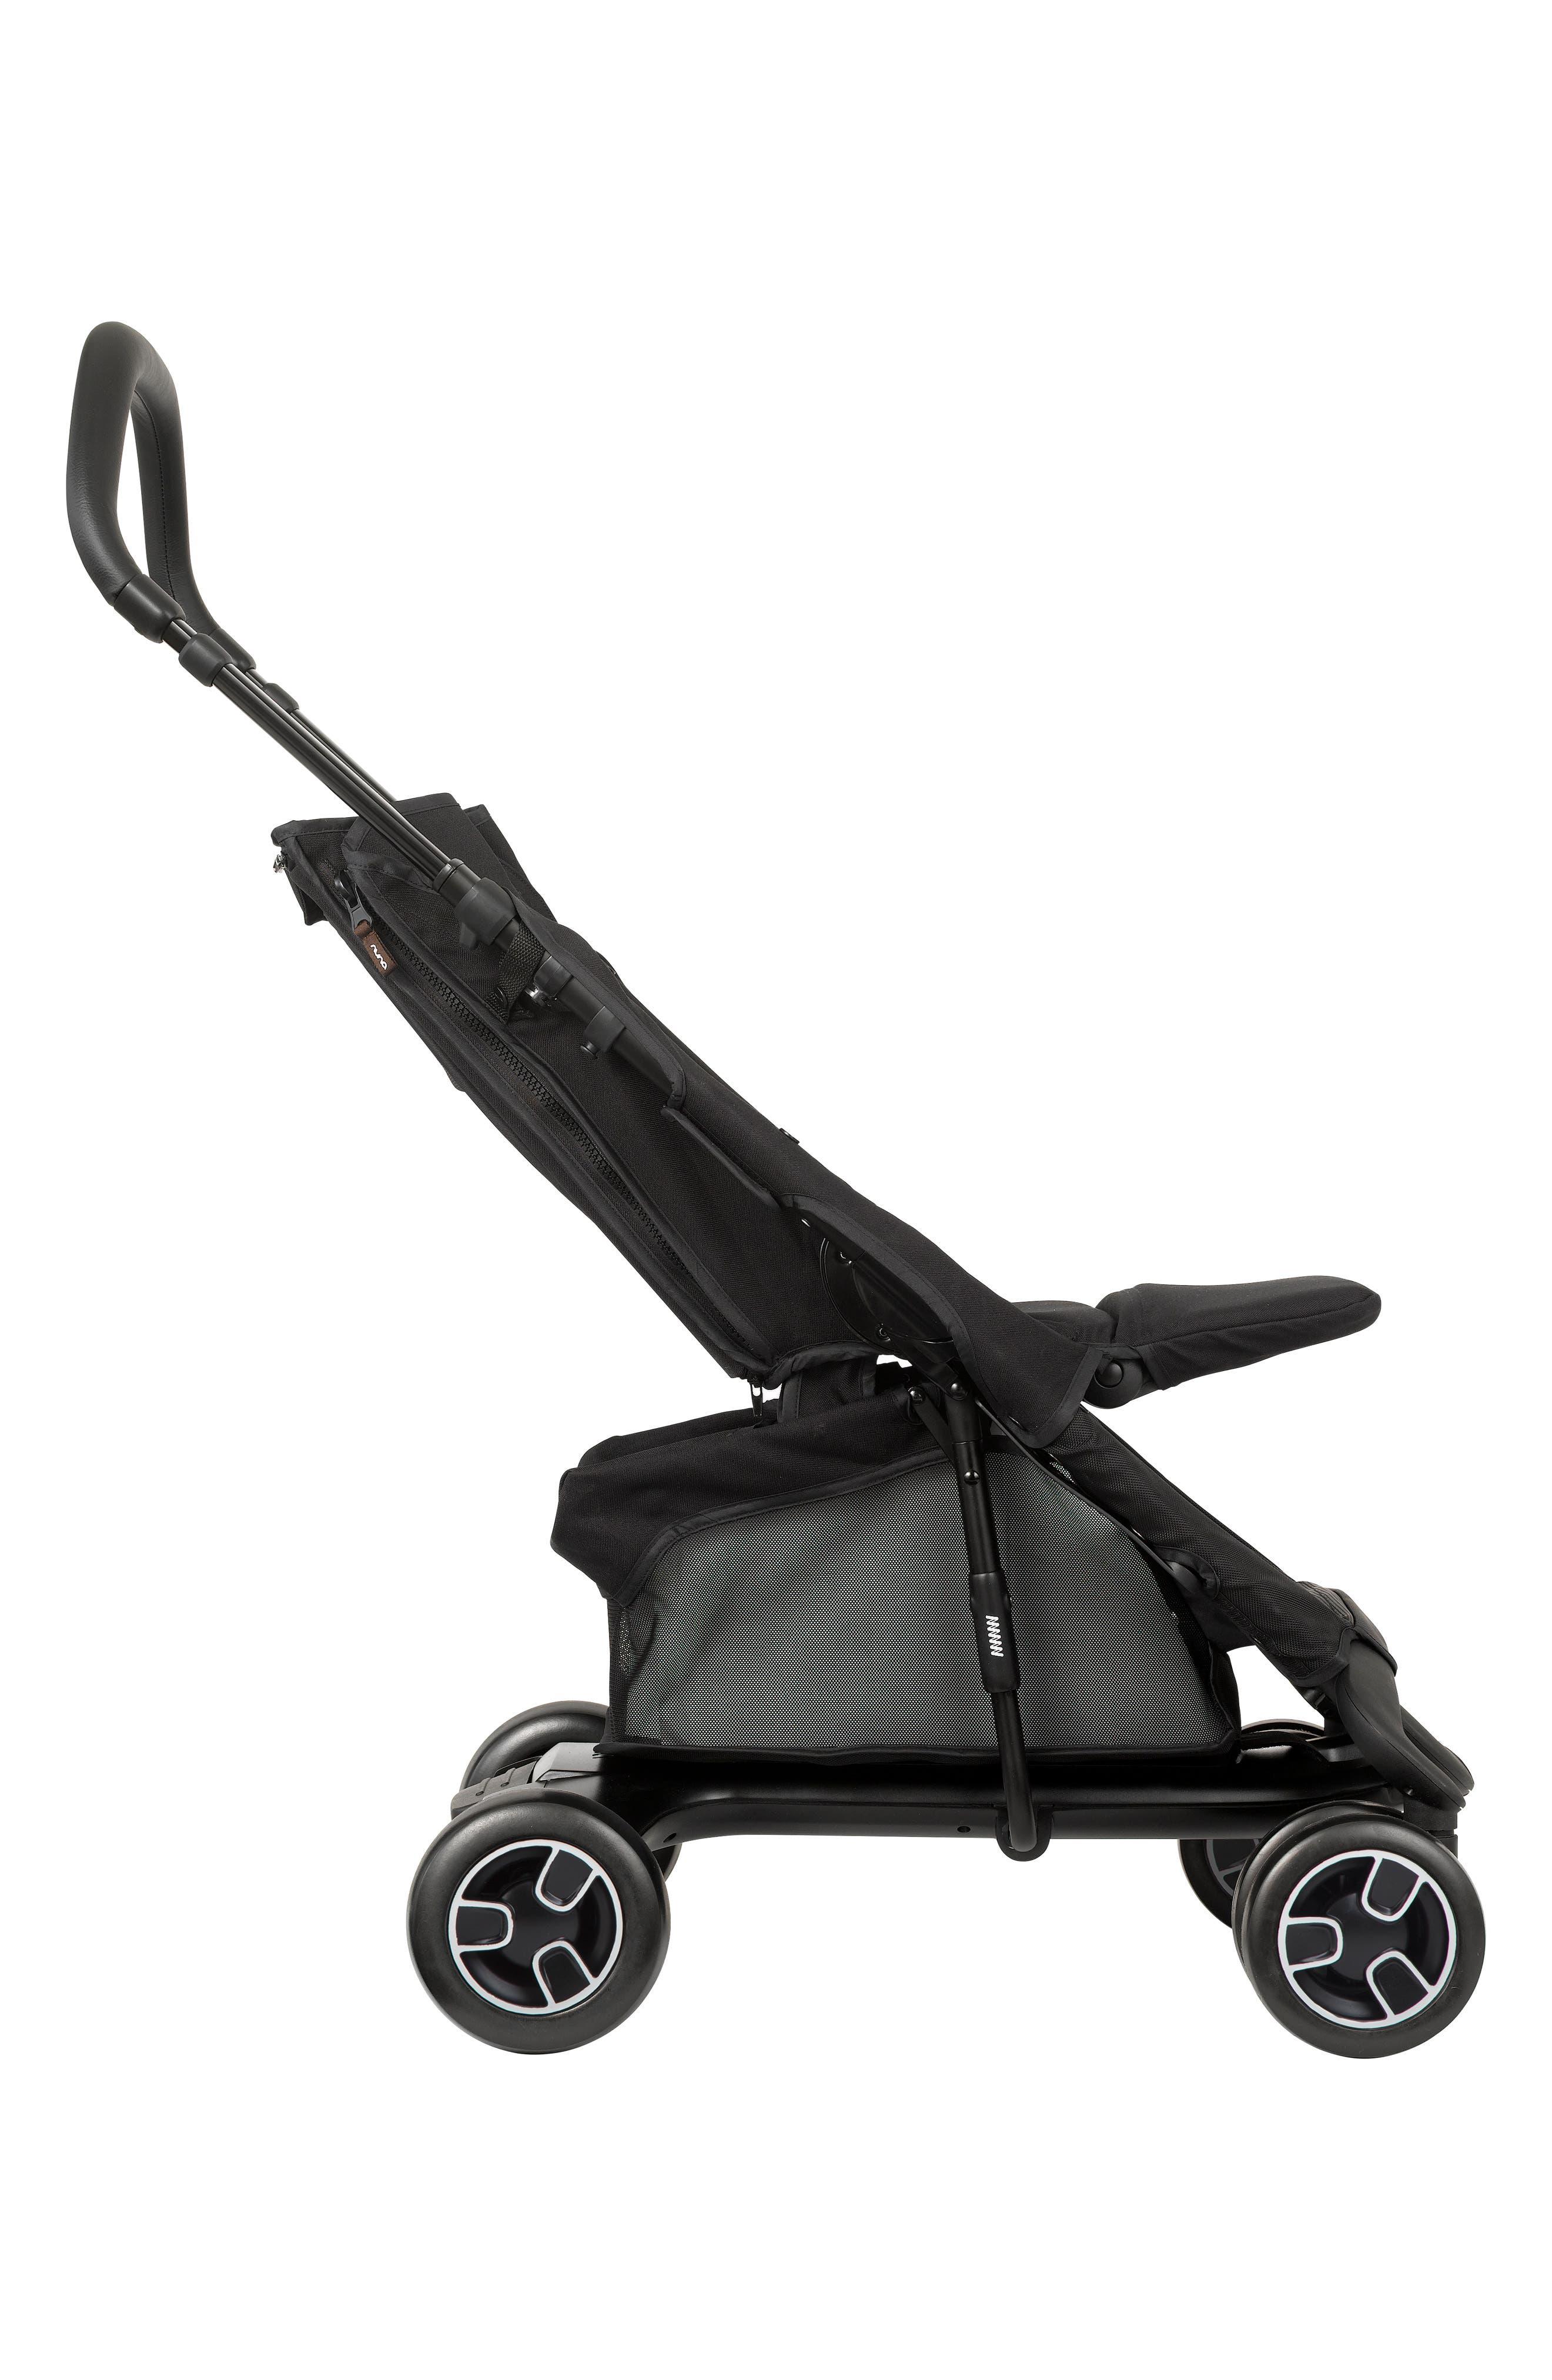 PEPP<sup>™</sup> Next Stroller,                             Main thumbnail 1, color,                             CAVIAR